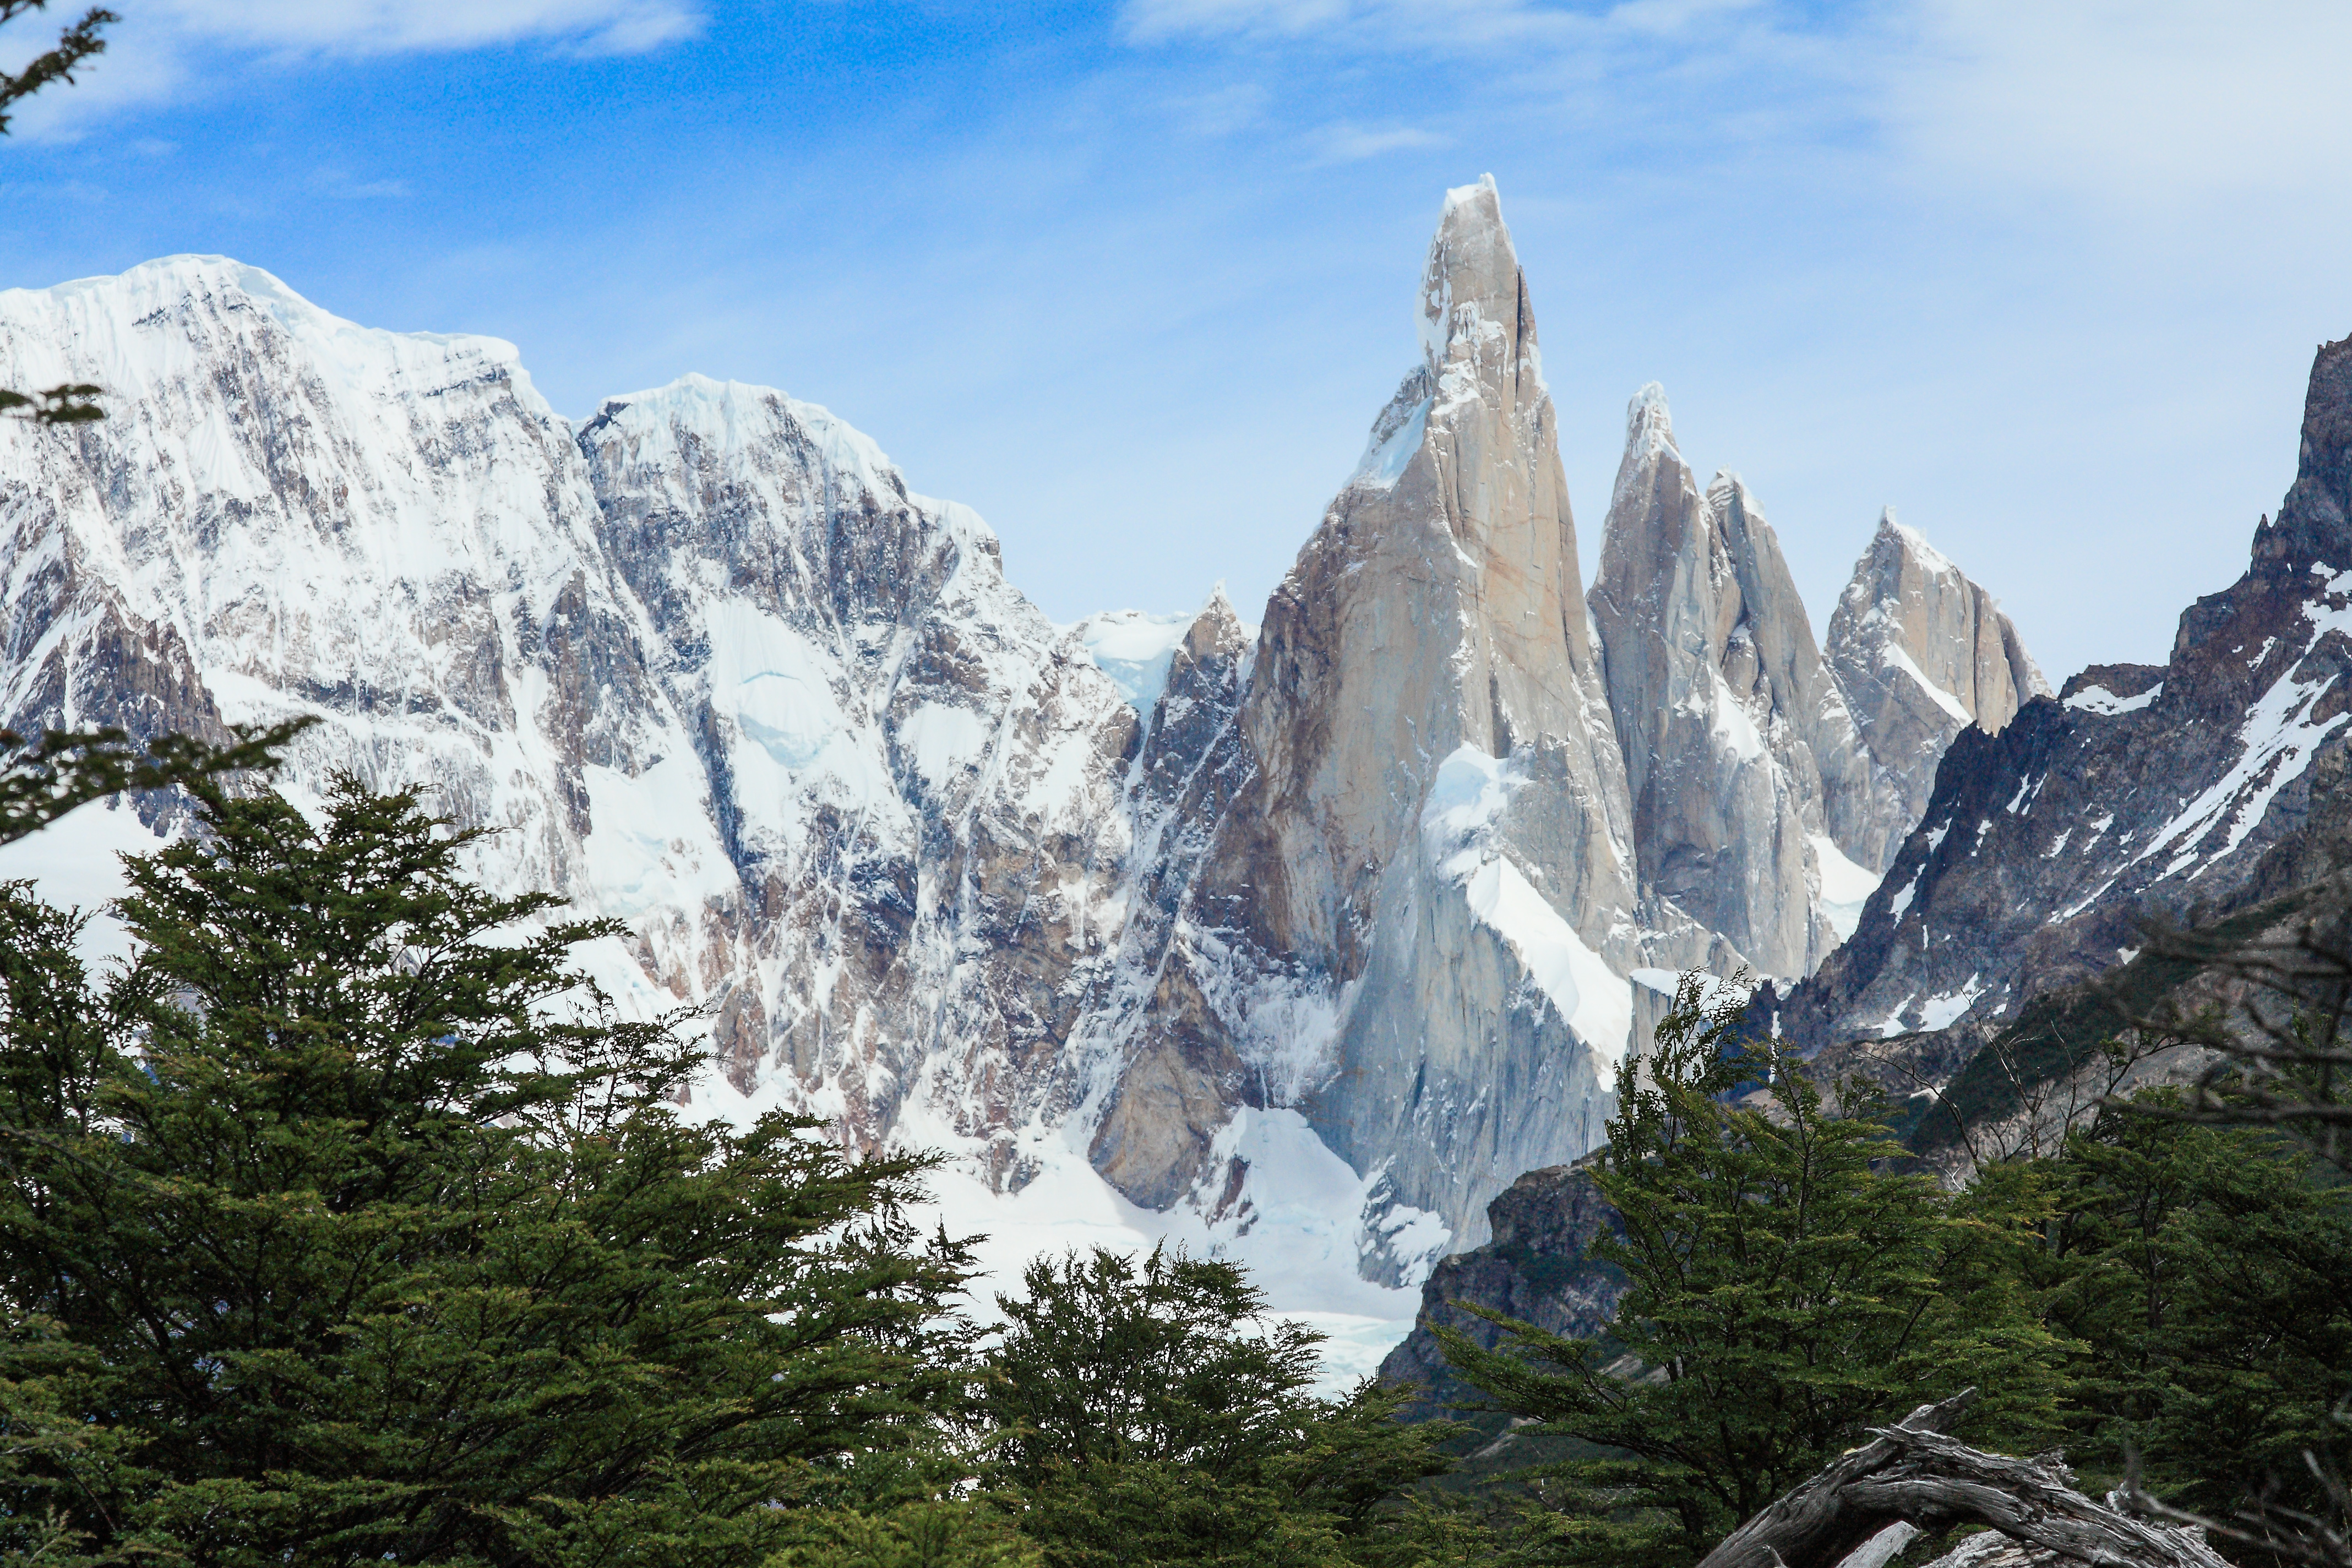 Laguna Torre hike - Los Glaciares National Park